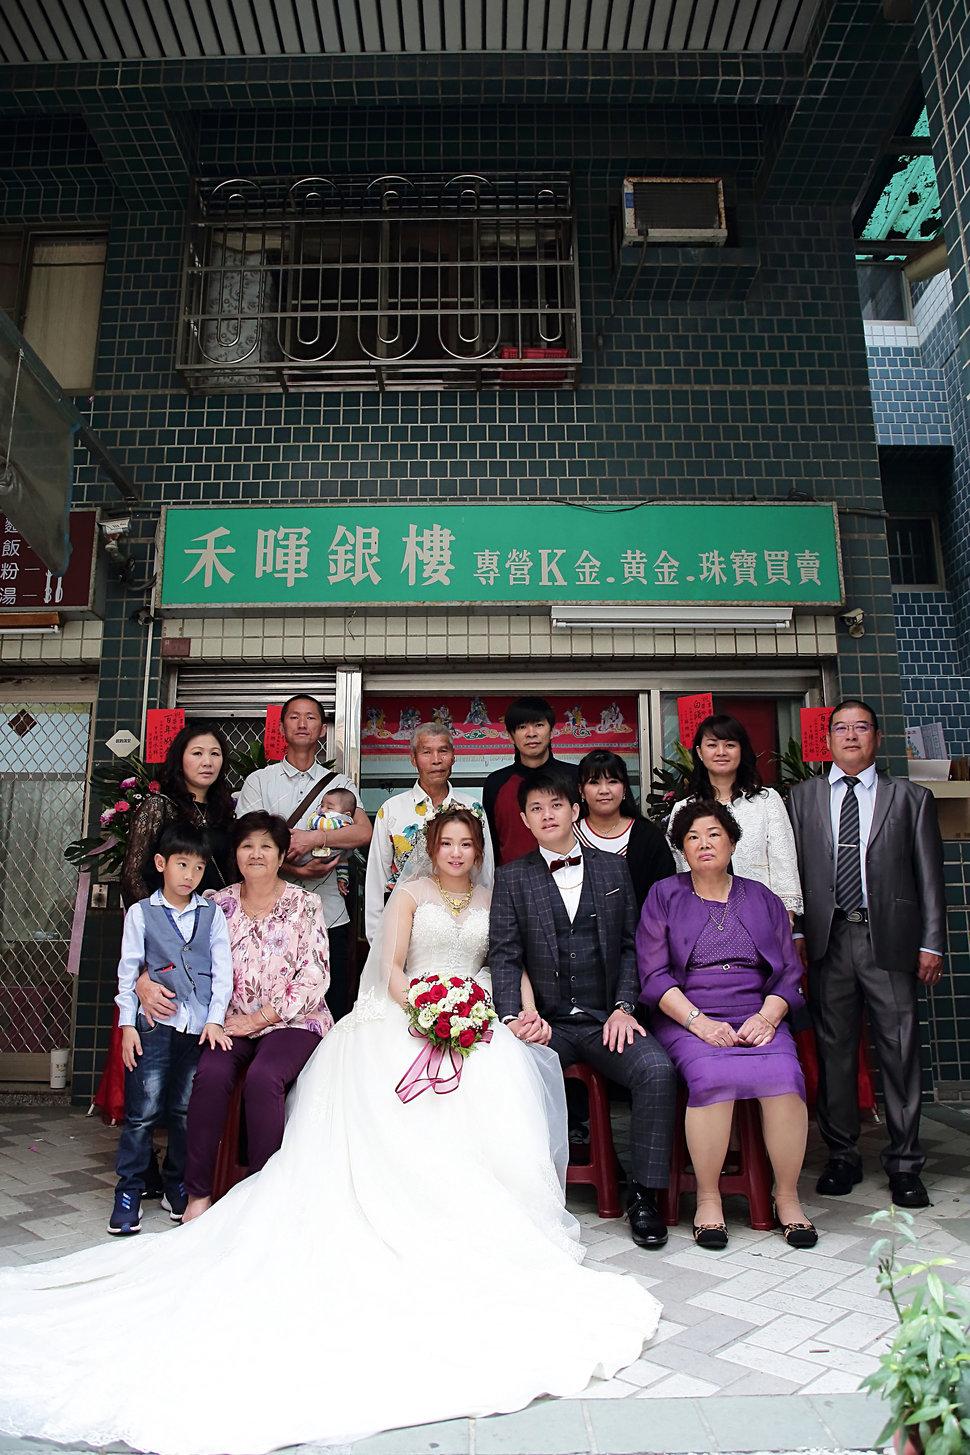 201902230233 - Loveliness ♥ wedding - 結婚吧